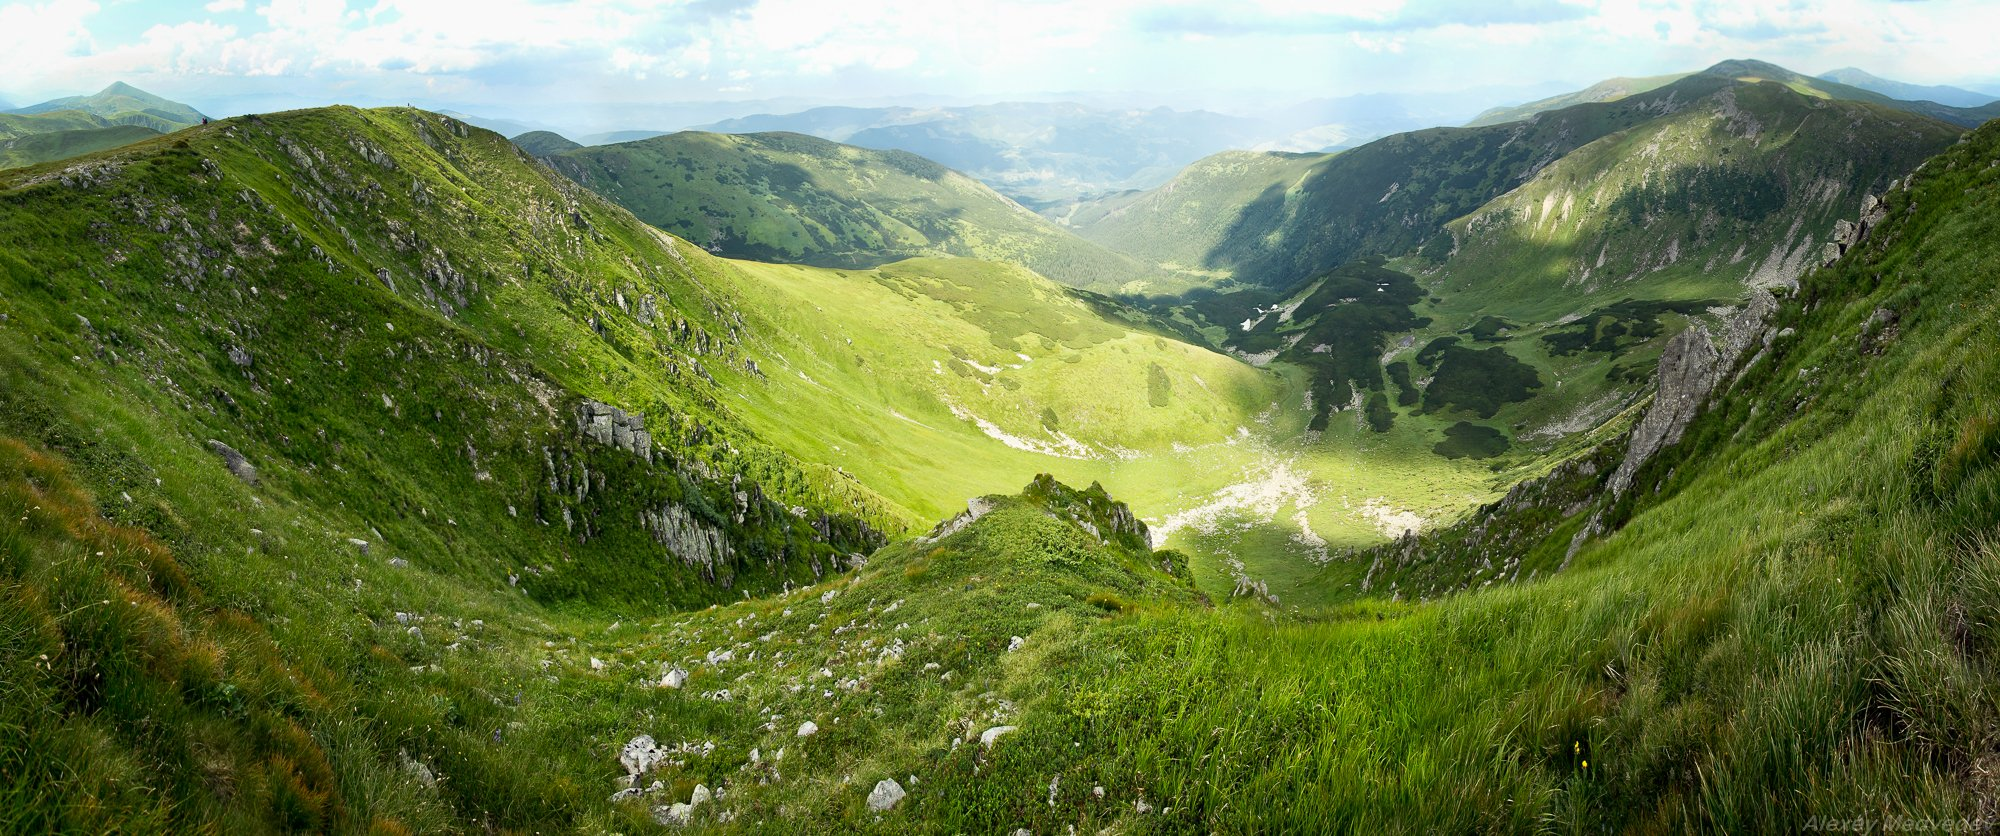 горы,  Карпати, полонина, скеля, сонце, Чорногора, Карпаты, панорама,, Алексей Медведев